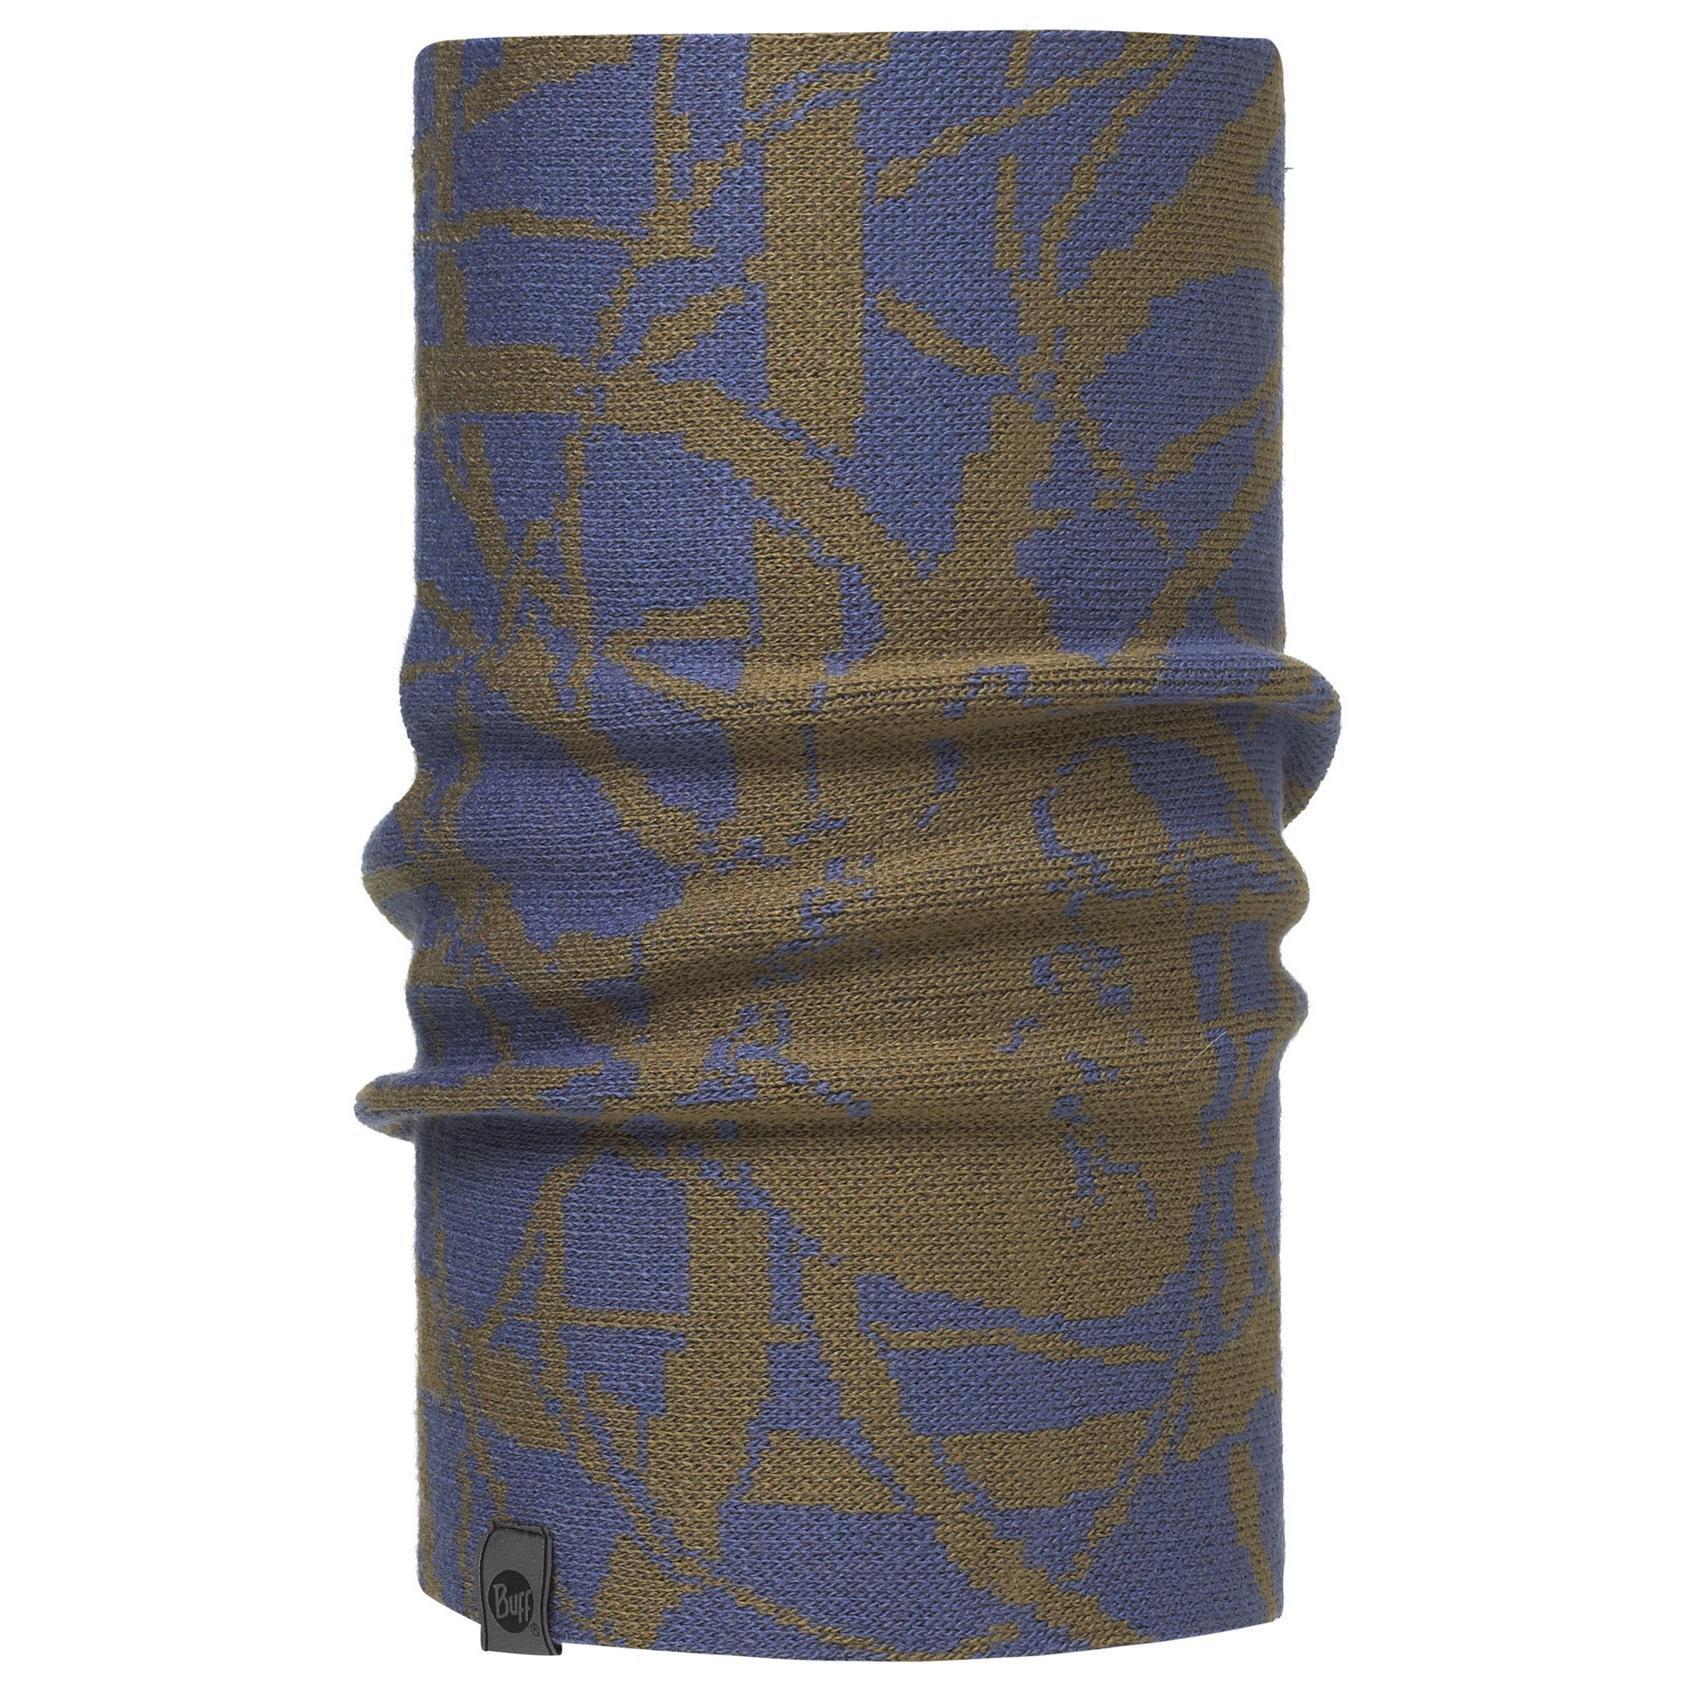 Купить Шарф BUFF URBAN Varsity MAIDENHEAD DELFT, Банданы и шарфы Buff ®, 879572